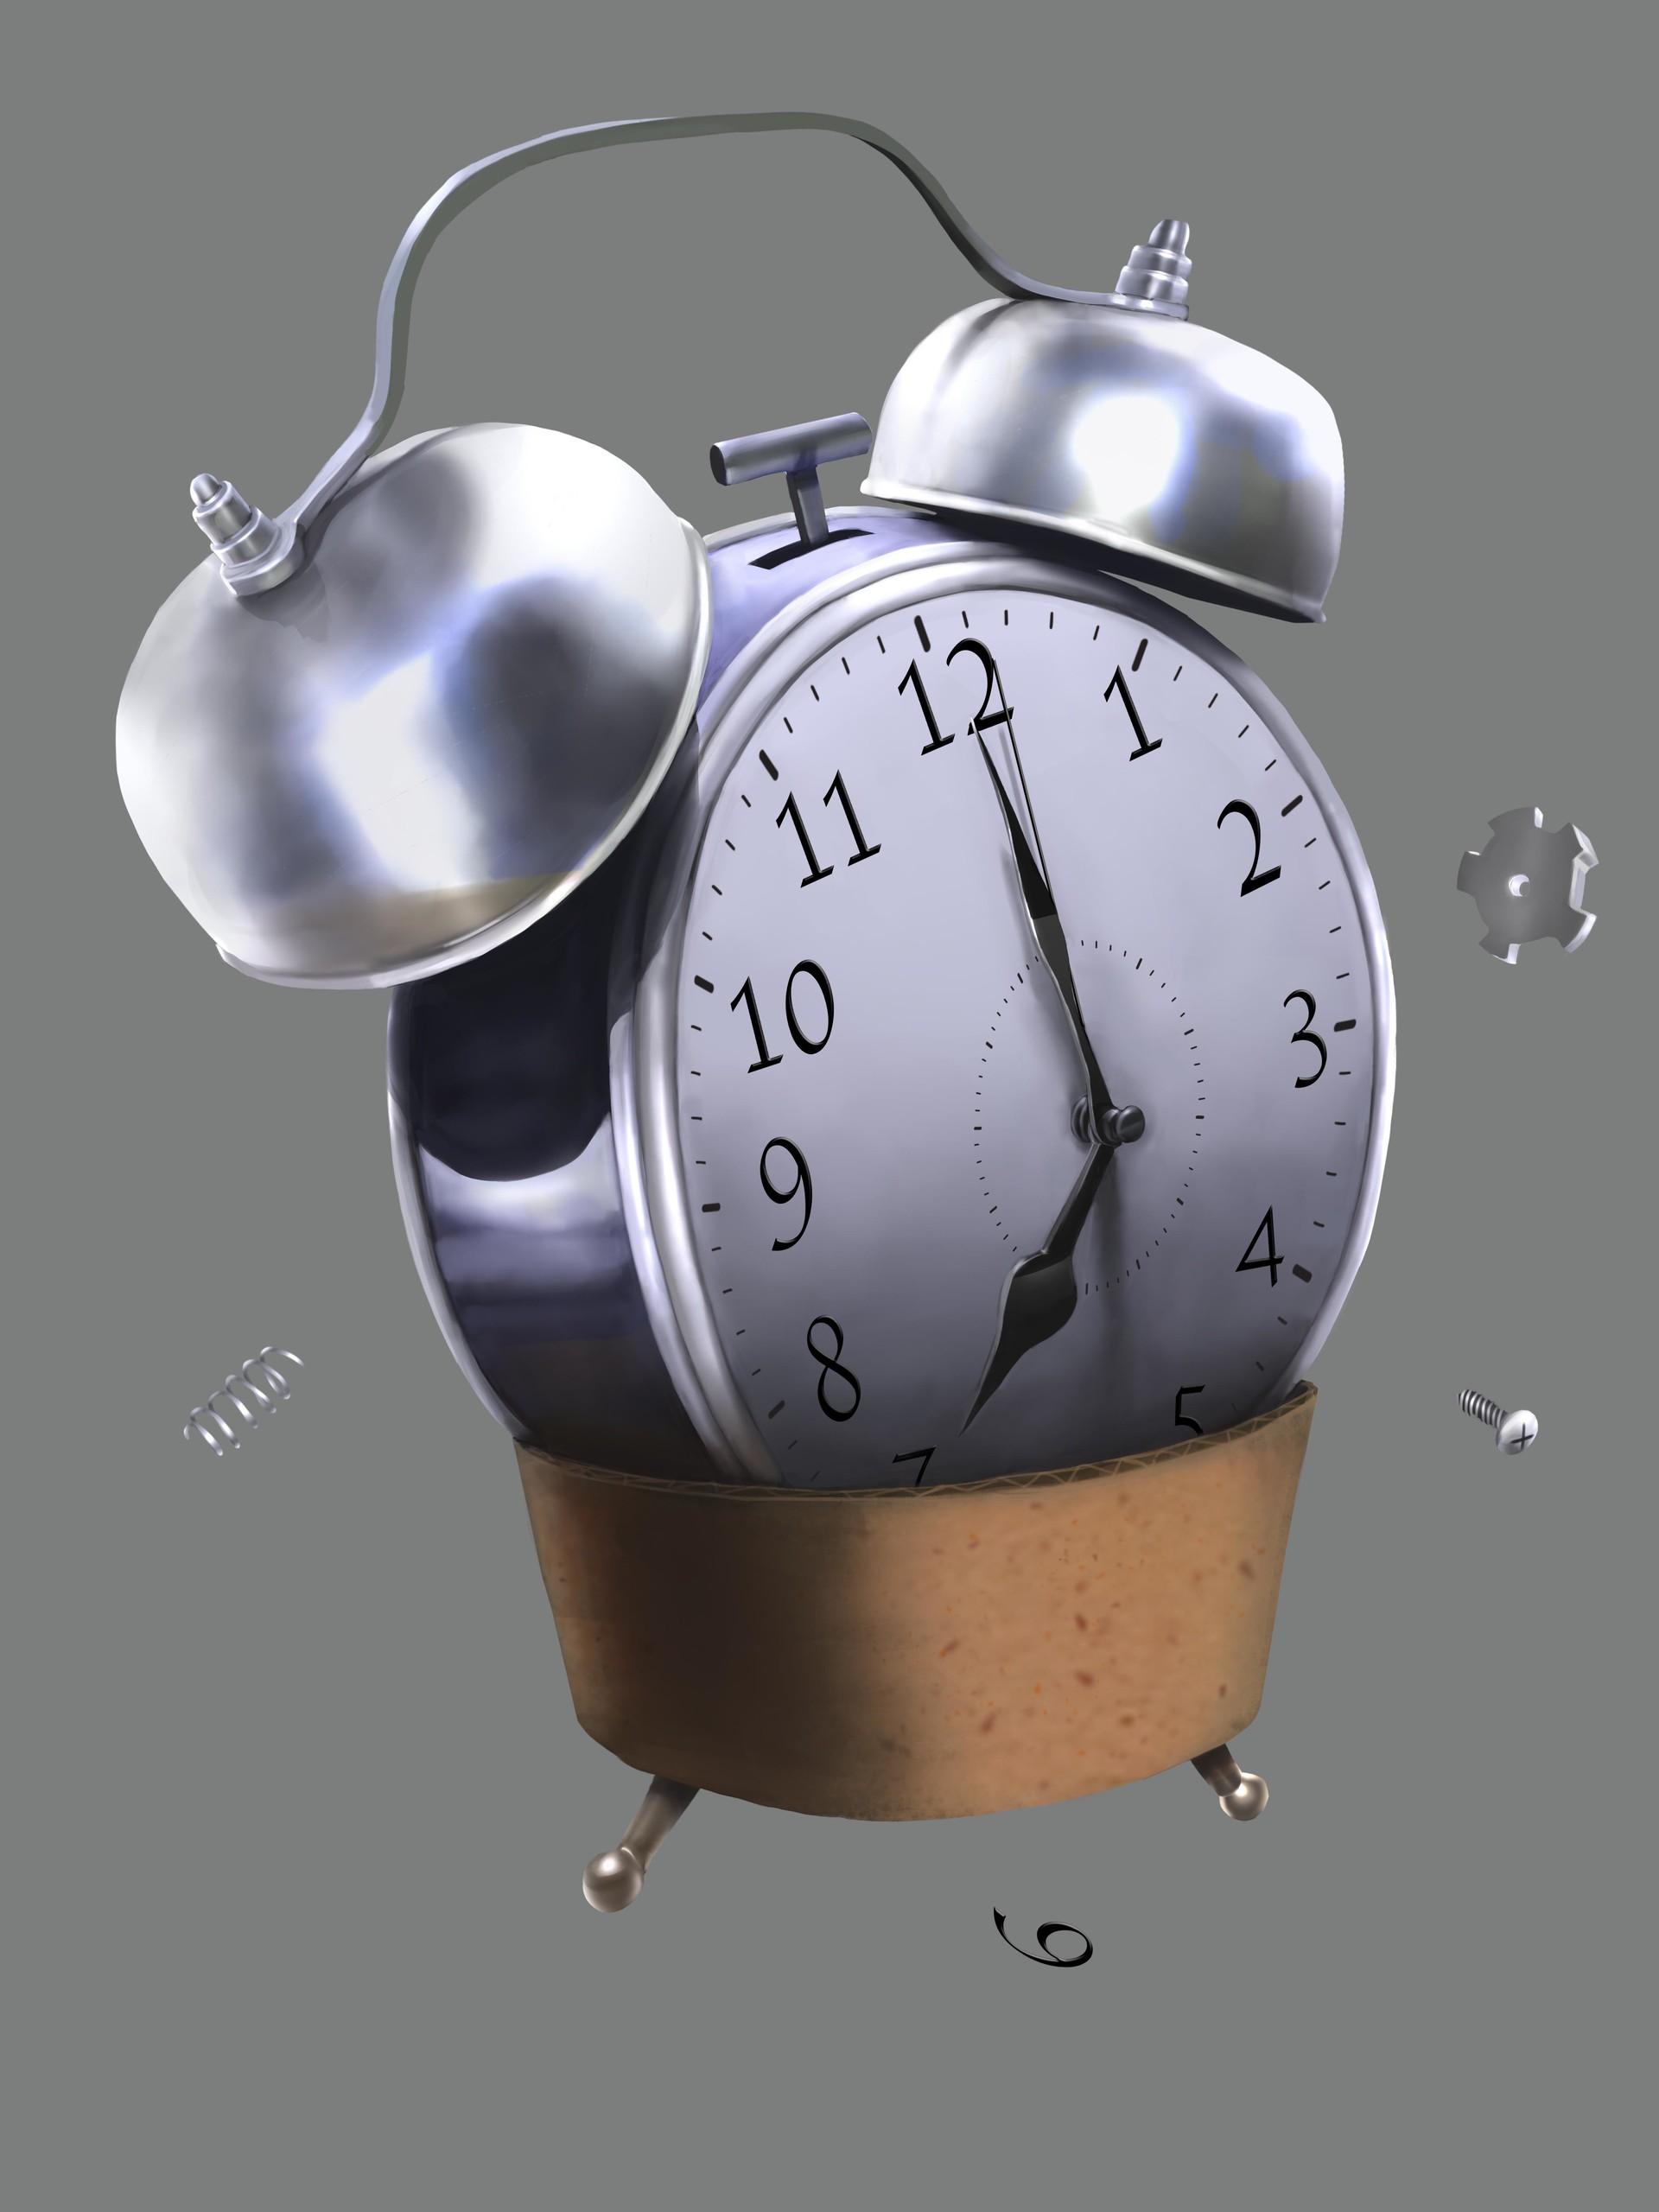 Adrian retana reloj